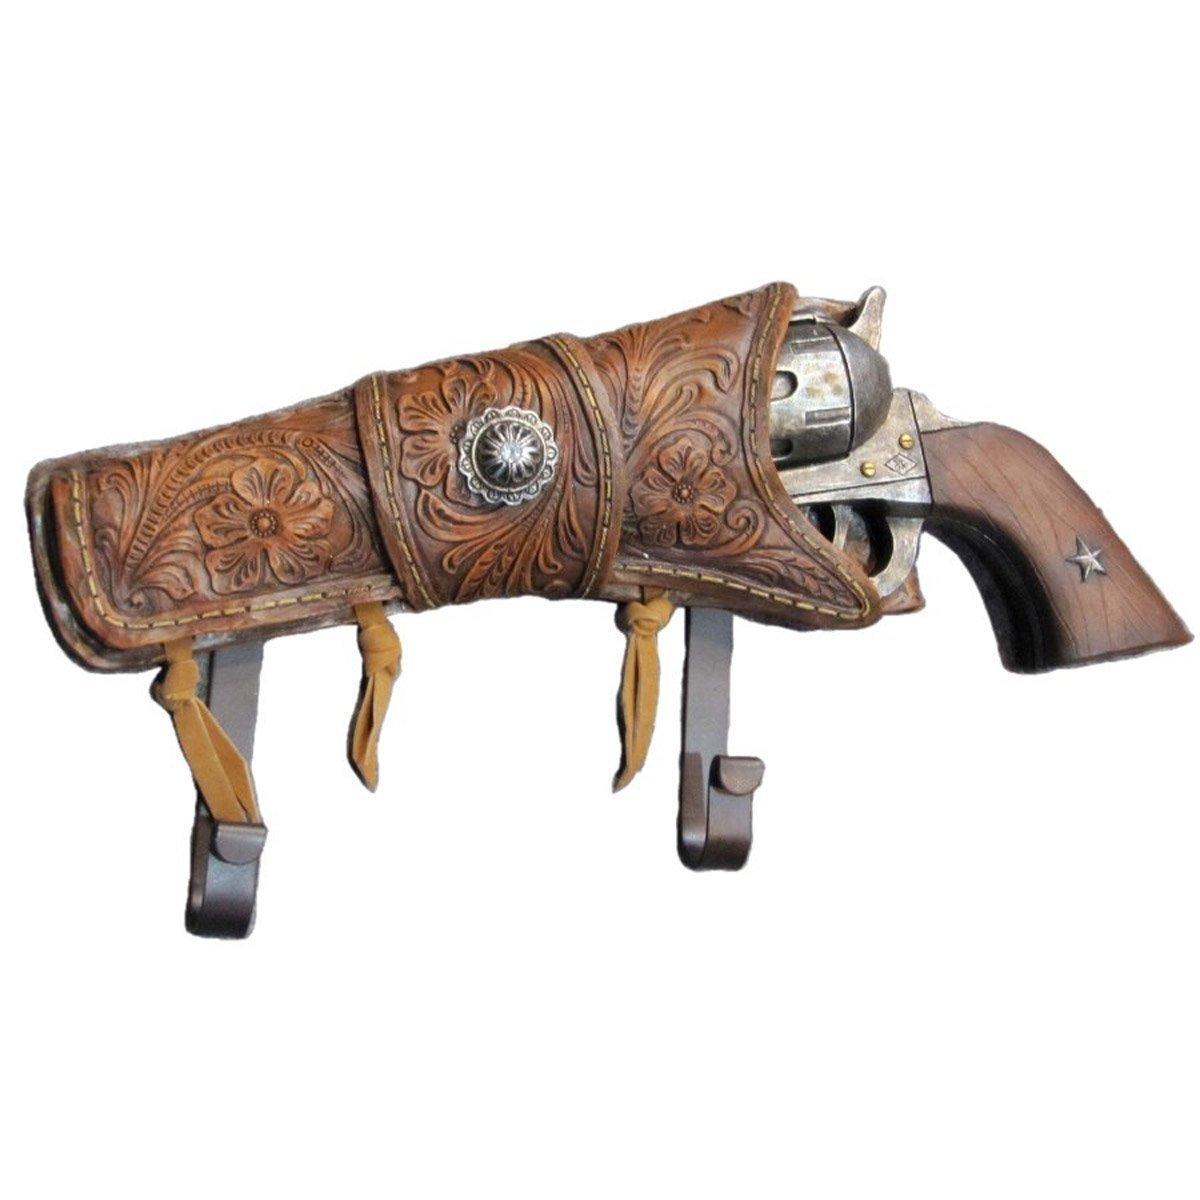 Coat Hook Hanger Rack Revolver Gun Pistol Western Decor